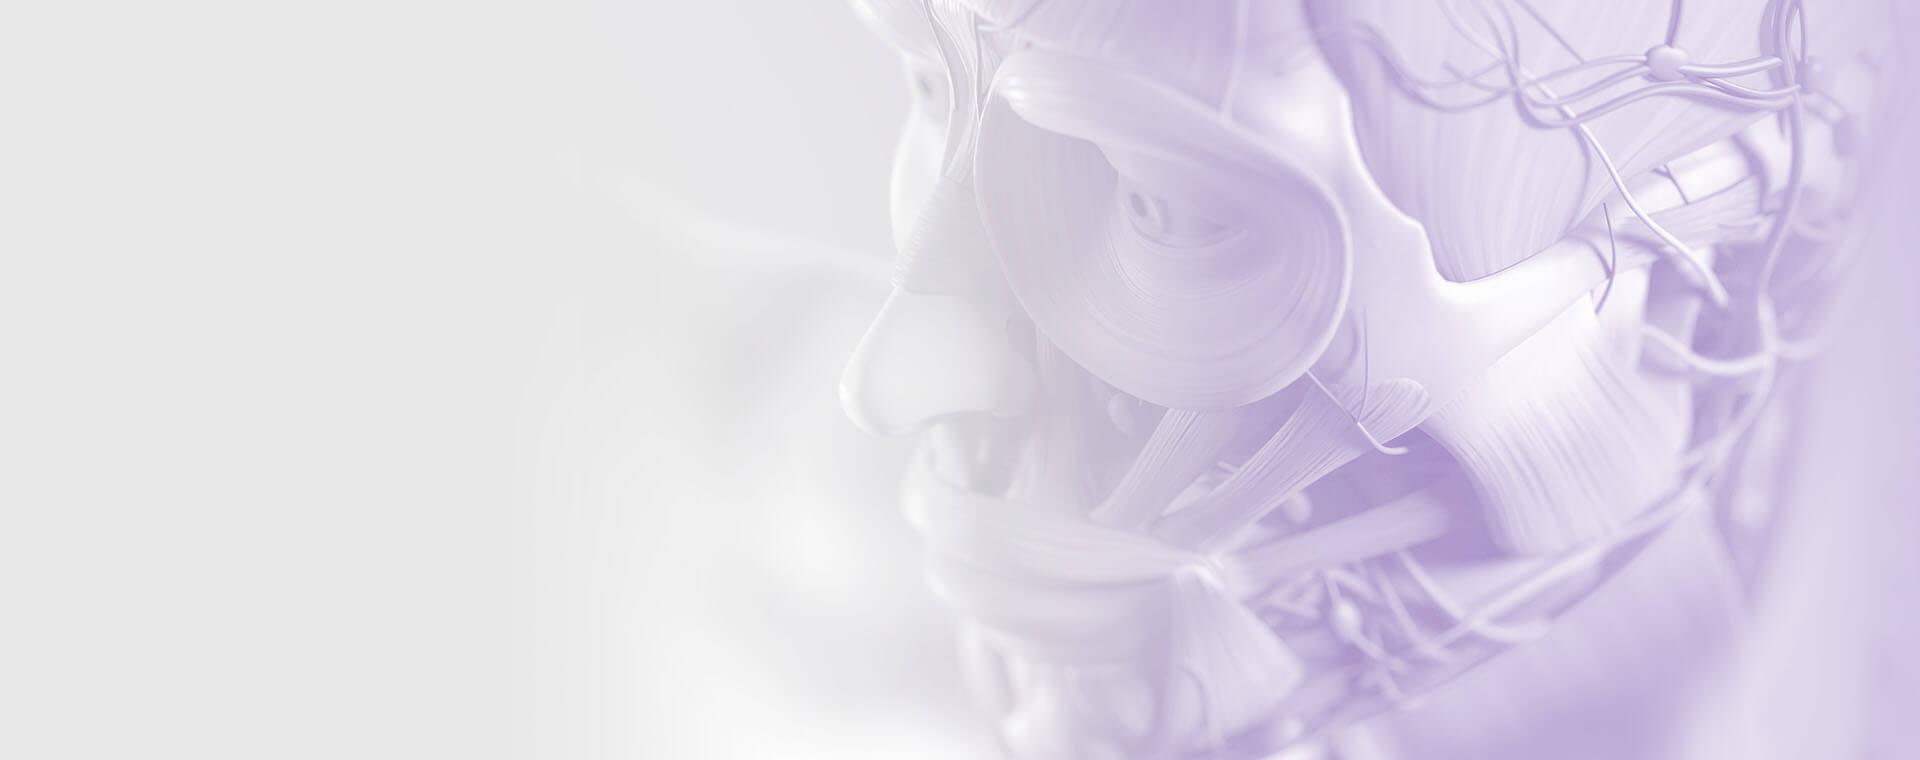 Plastic Surgery Chicago - Reconstructive Surgery | Dr  Marco